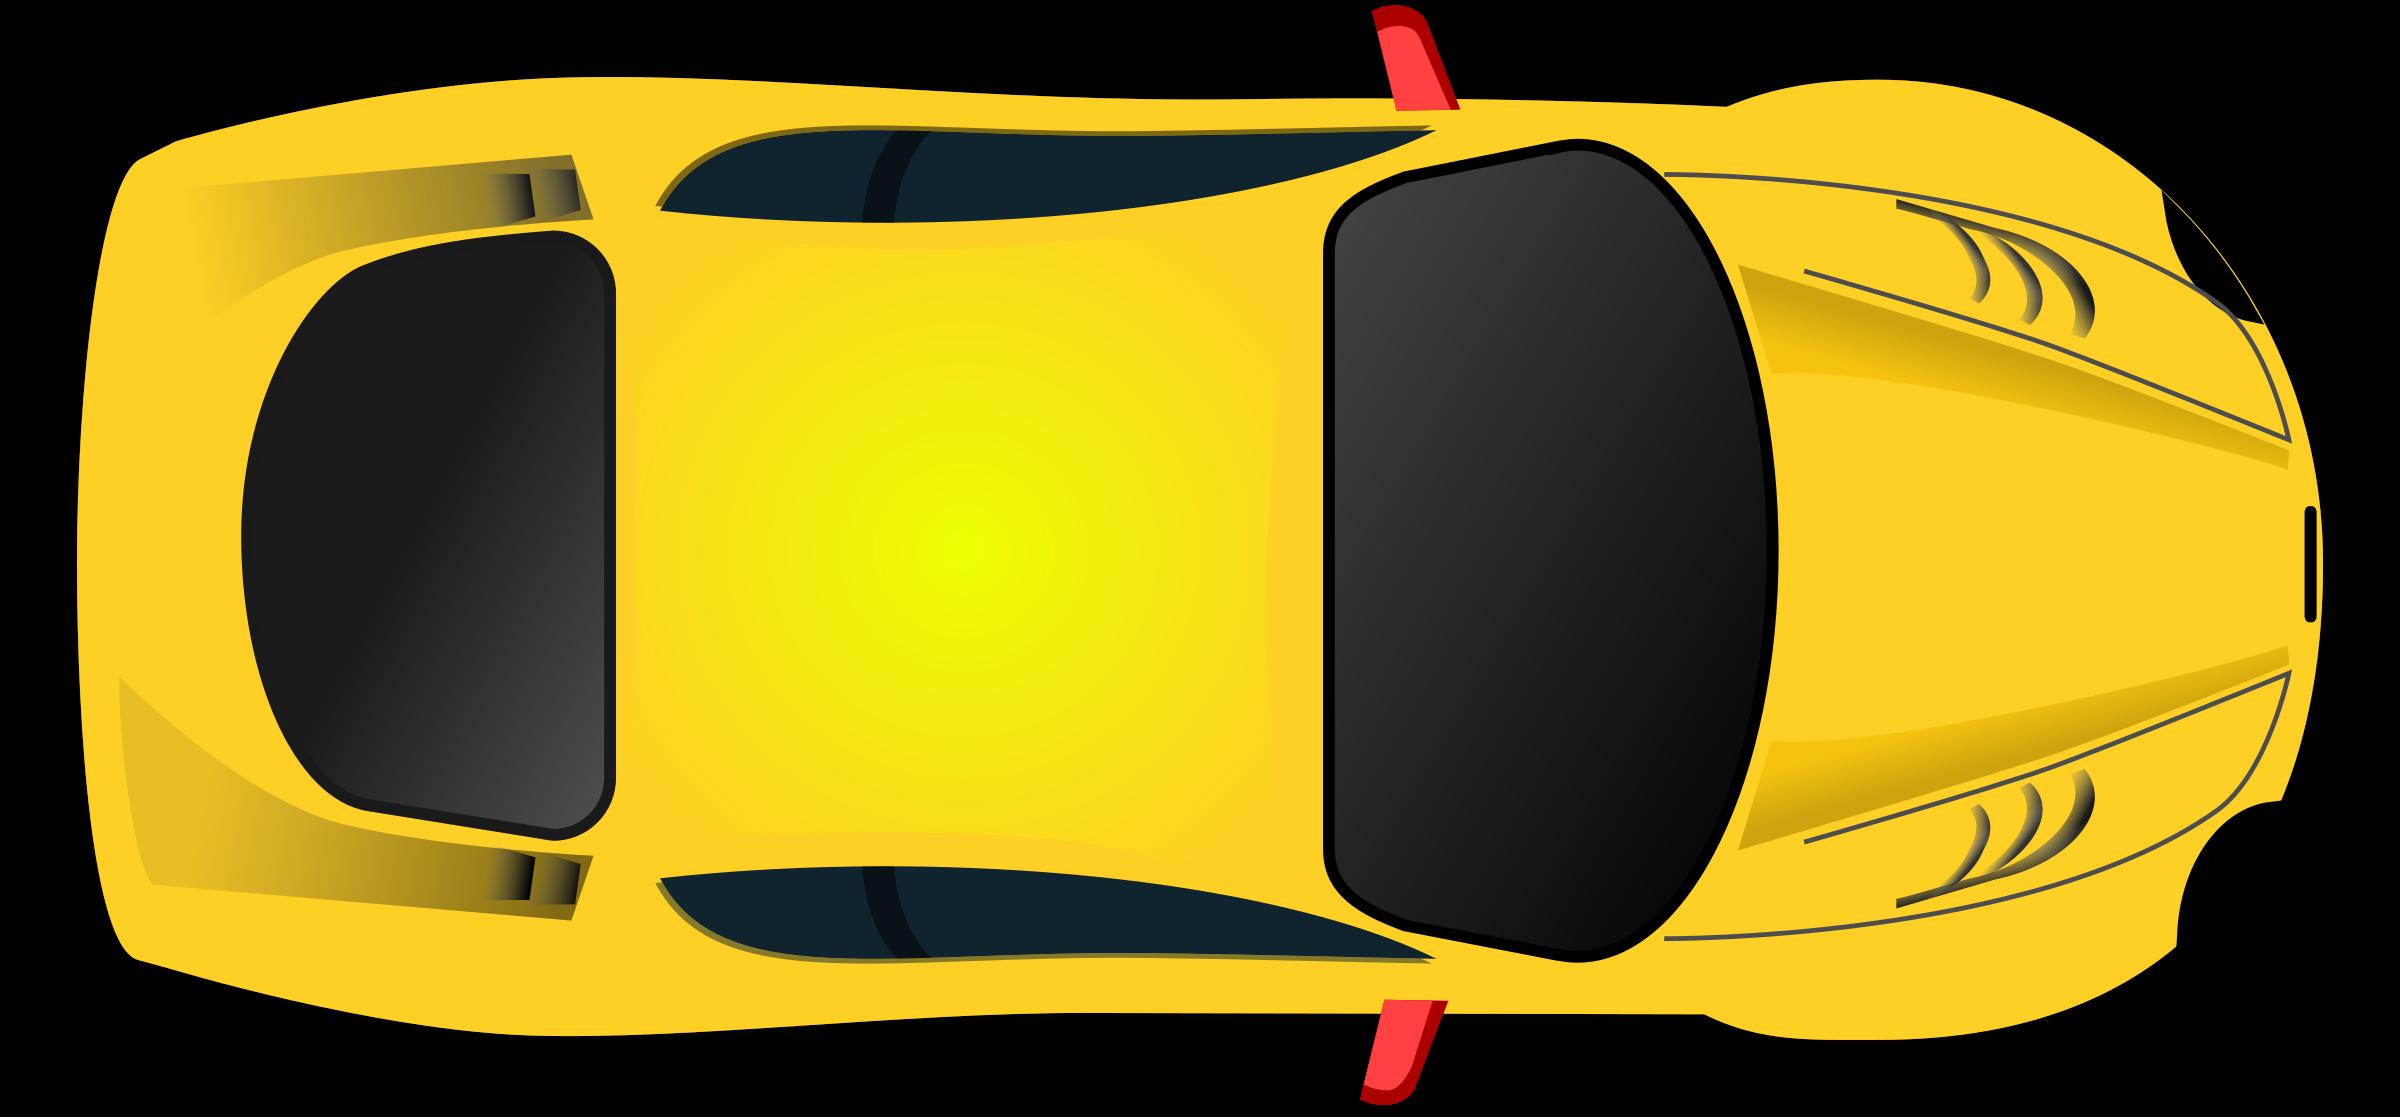 Race clipart racing stripes. Car top view remix